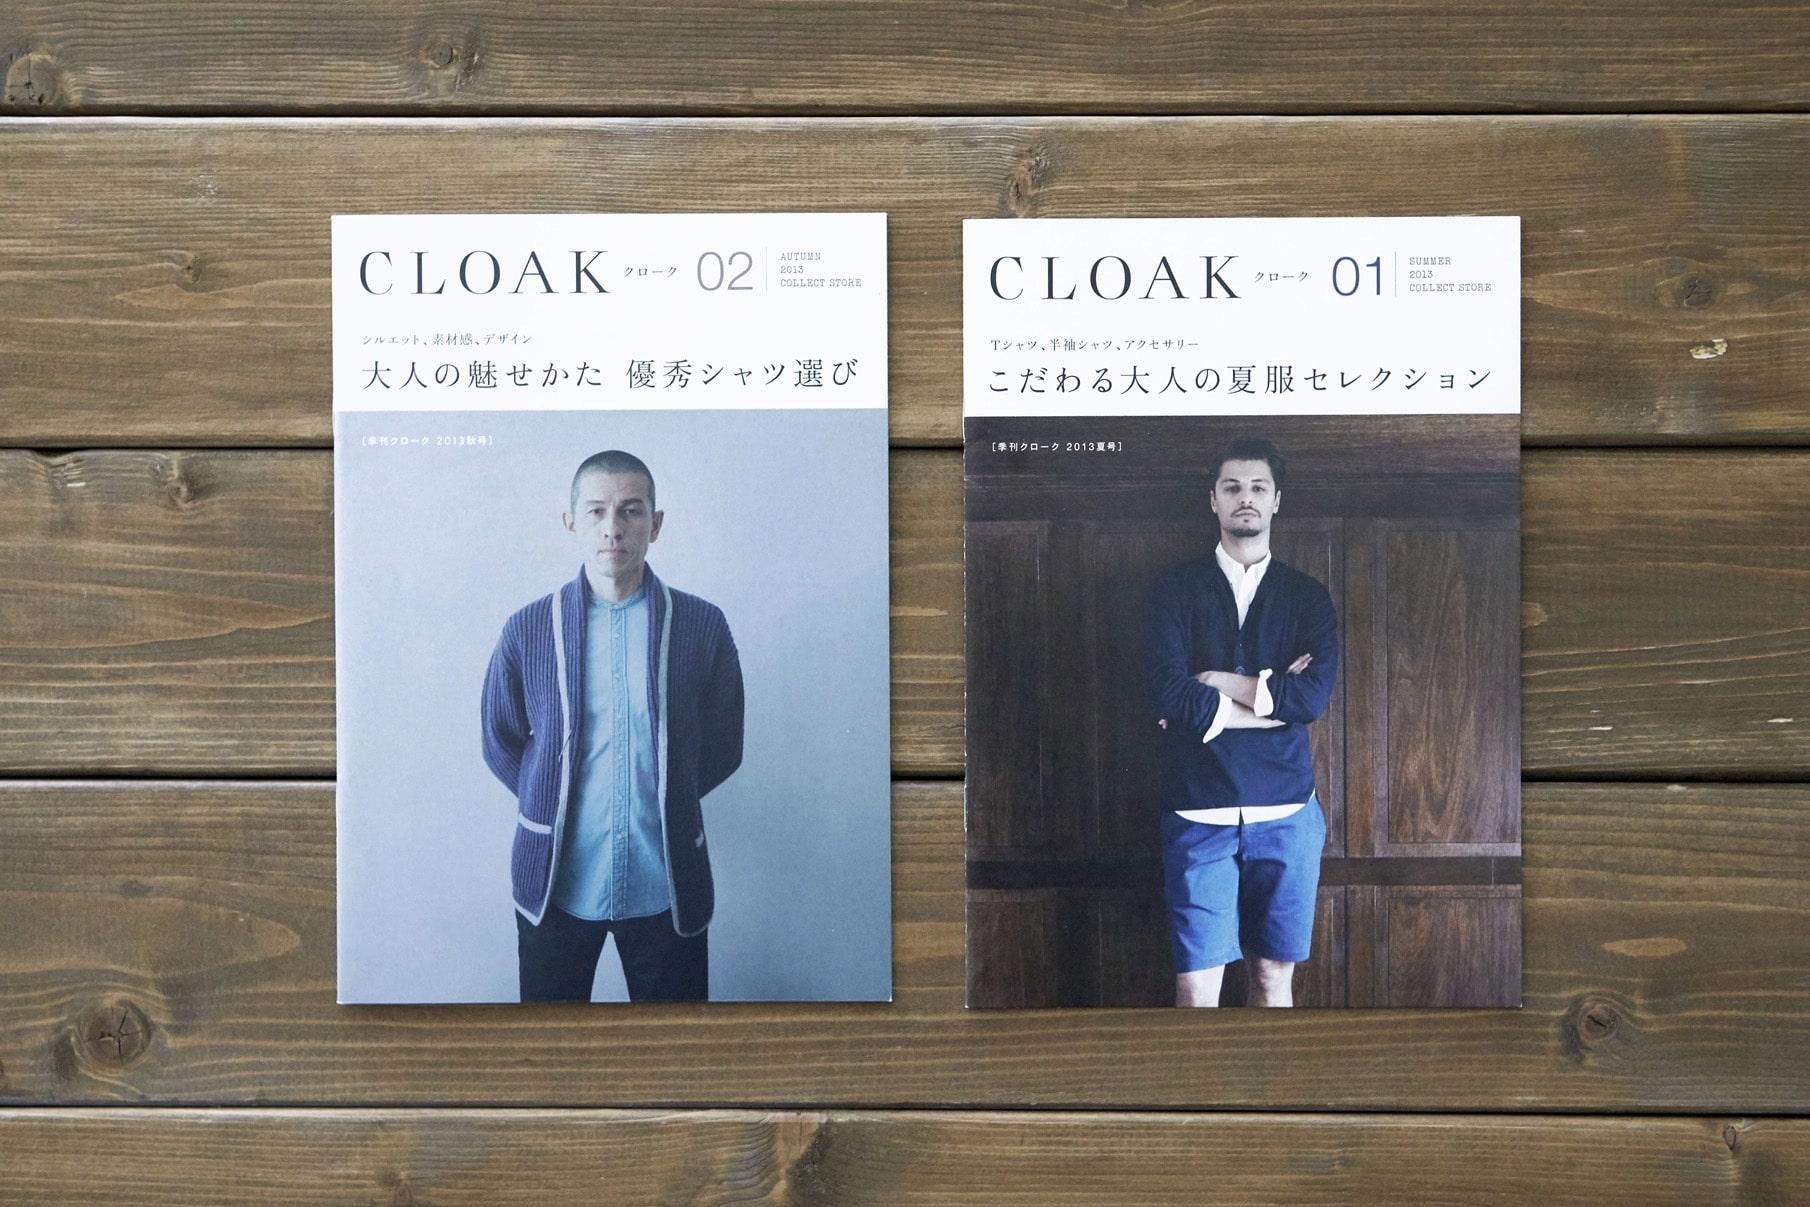 CLOAK Vol.1, Vol.2 - Free Paper 1